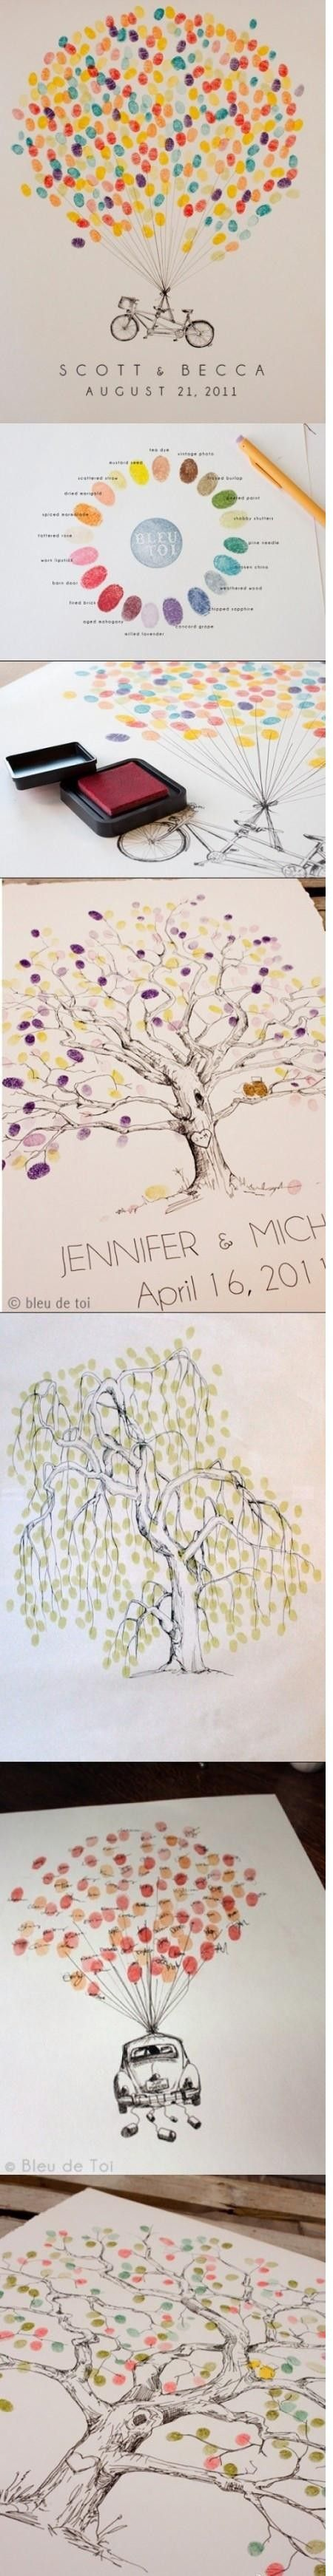 Fingerprint ideas. wedding guest books / family reunions. So cute!!